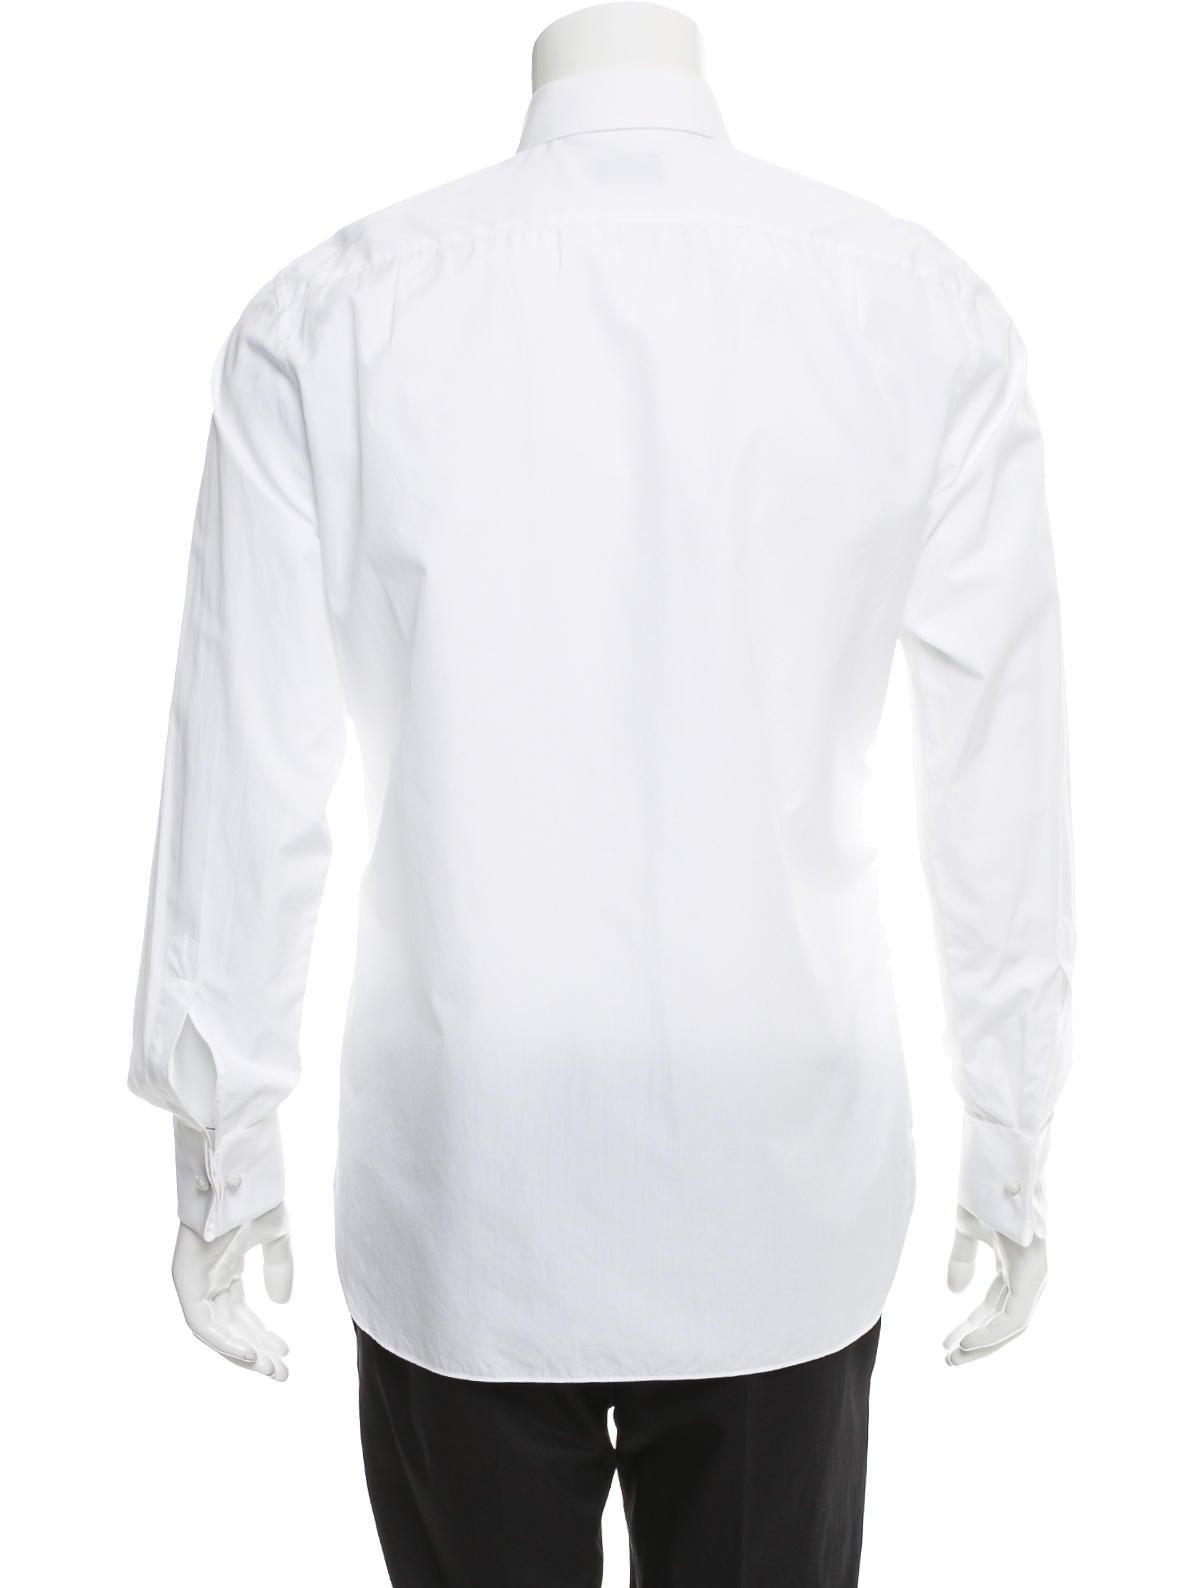 Ermenegildo zegna french cuff tuxedo shirt clothing for Tuxedo shirt french cuff